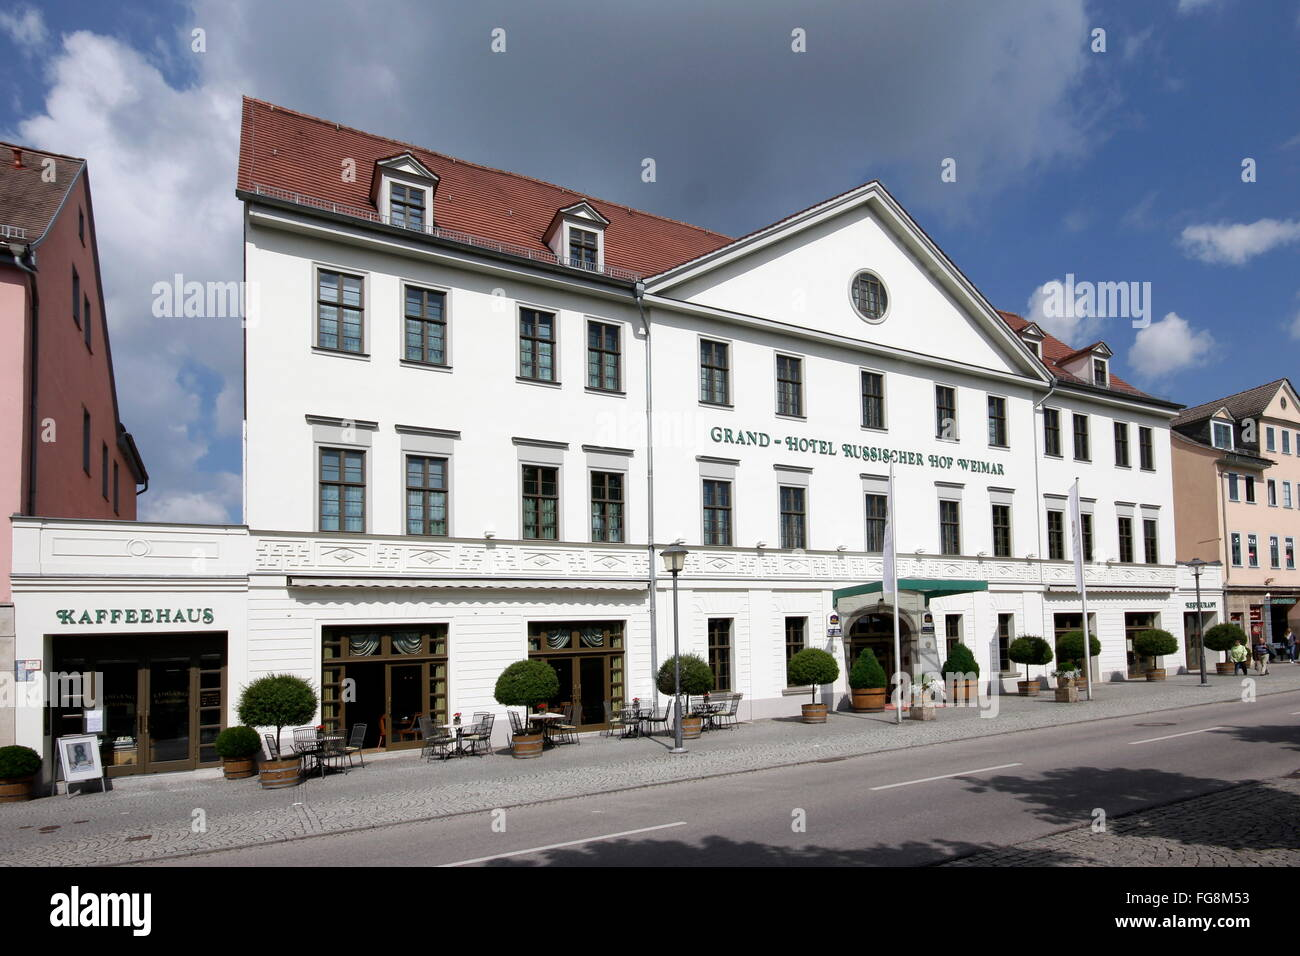 Géographie / voyage, Allemagne, Thuringe, Weimar, l'hôtel 'Villa Stokkum', Additional-Rights Clearance-Info-Not Banque D'Images